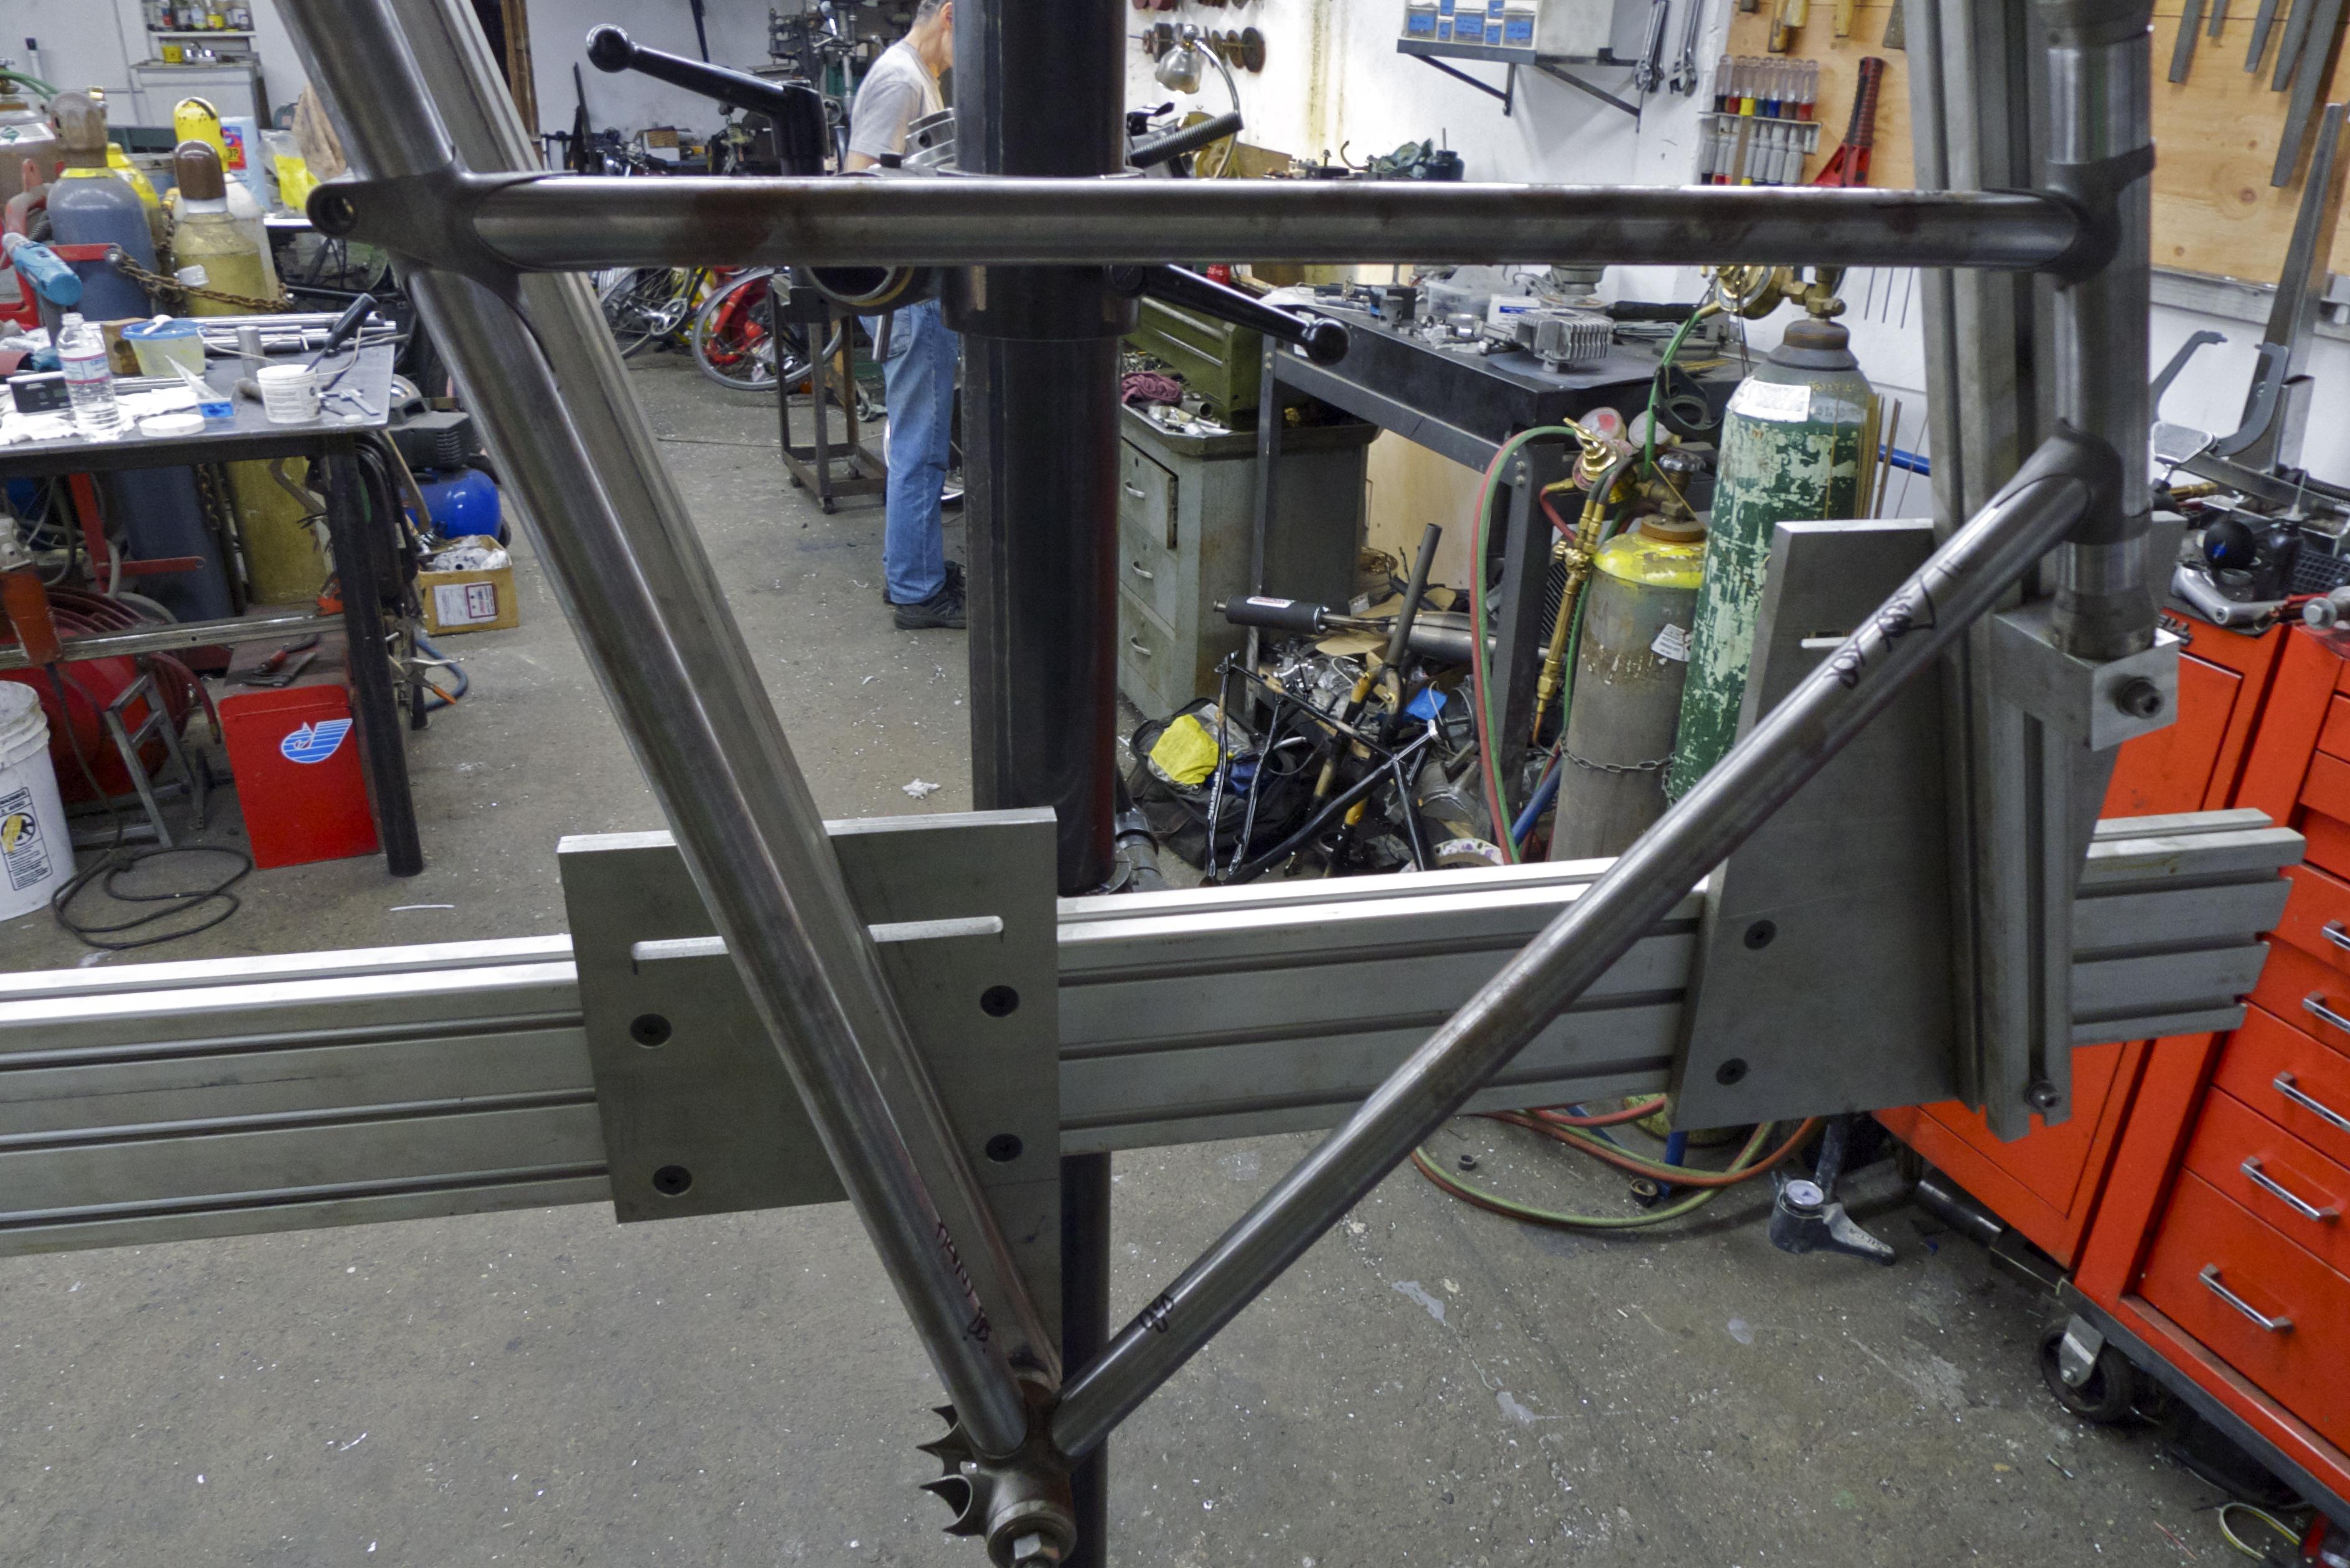 File:Frame building jig.jpg - Wikimedia Commons